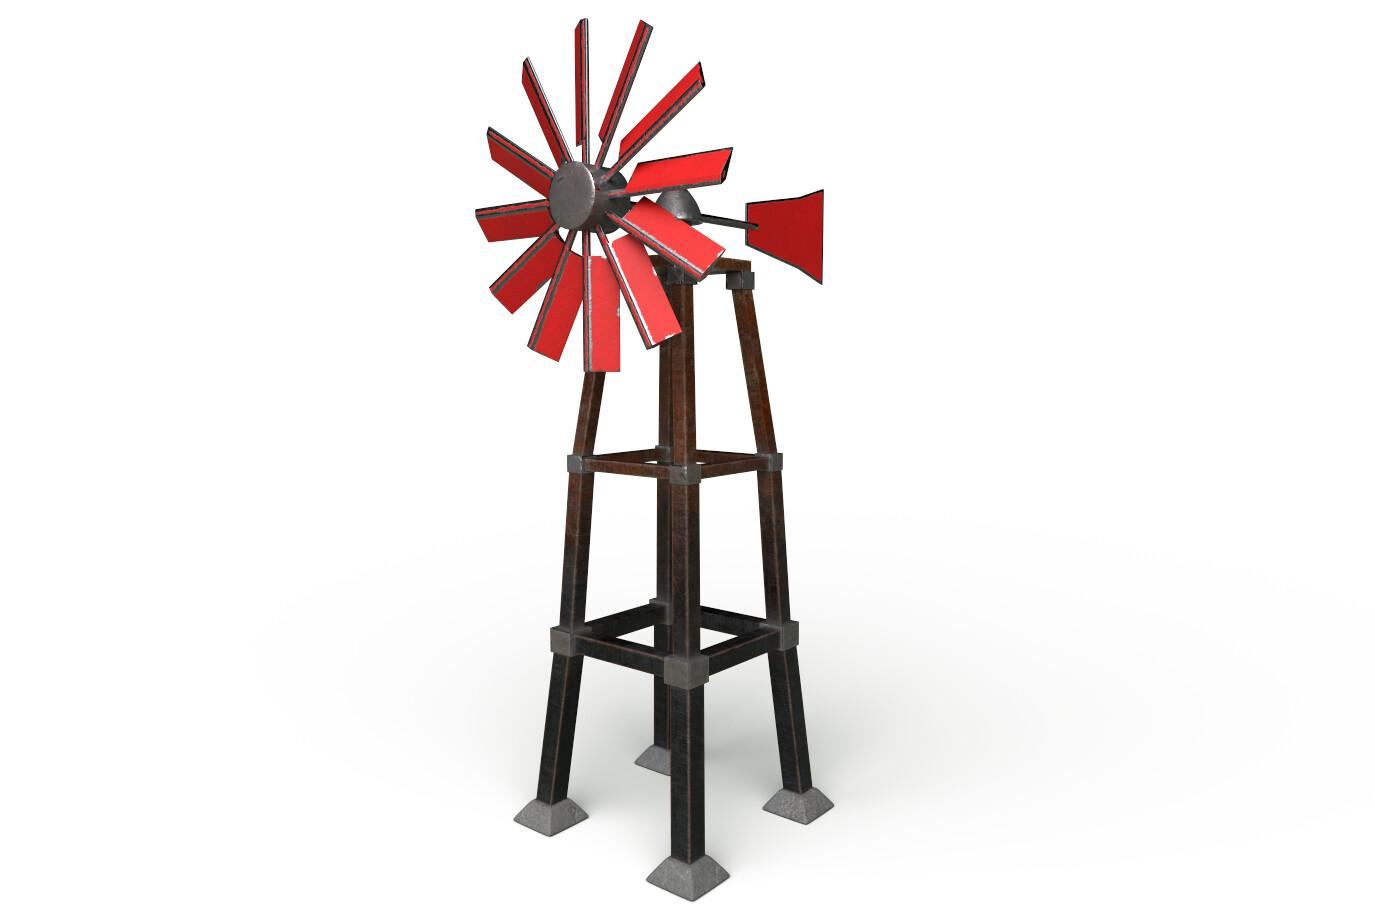 Joseph moniz windmill001d